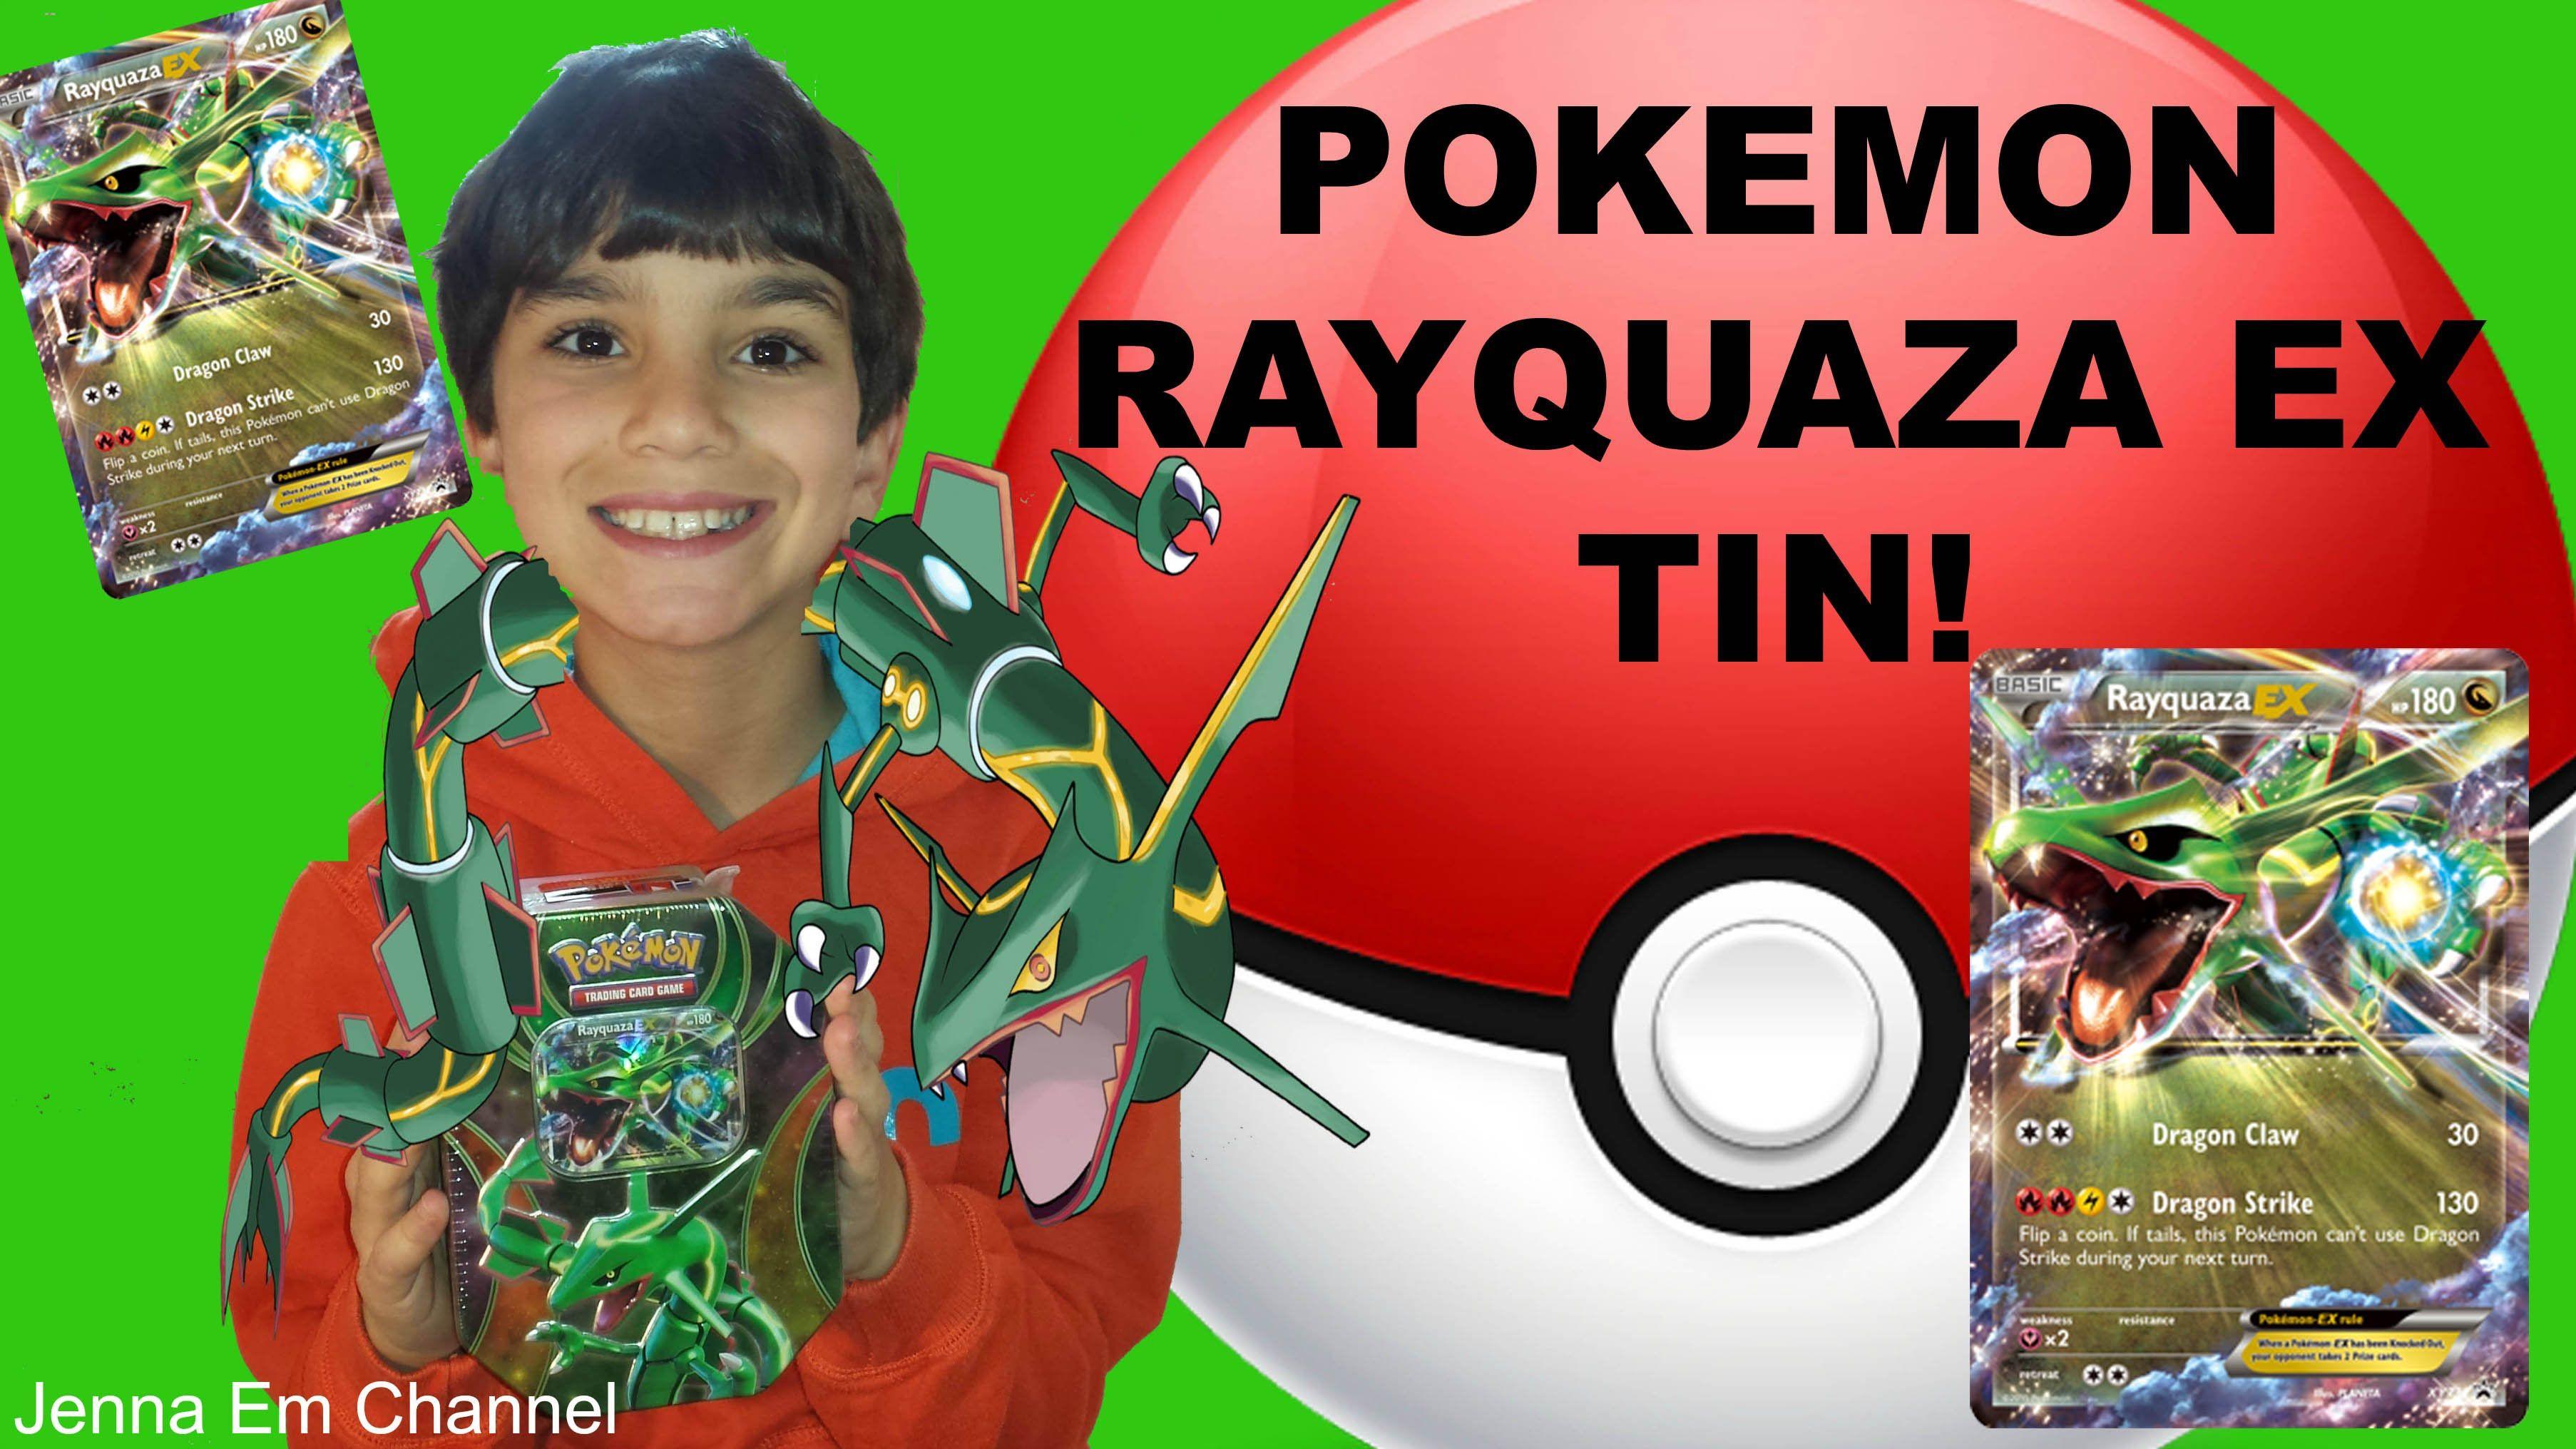 #VIDEO: #Pokemon #Rayquaza EX Power Beyond Tin Opening! Jenna Em Channel  WATCH: https://youtu.be/Ng5Q5ByThzM #Pokemon20